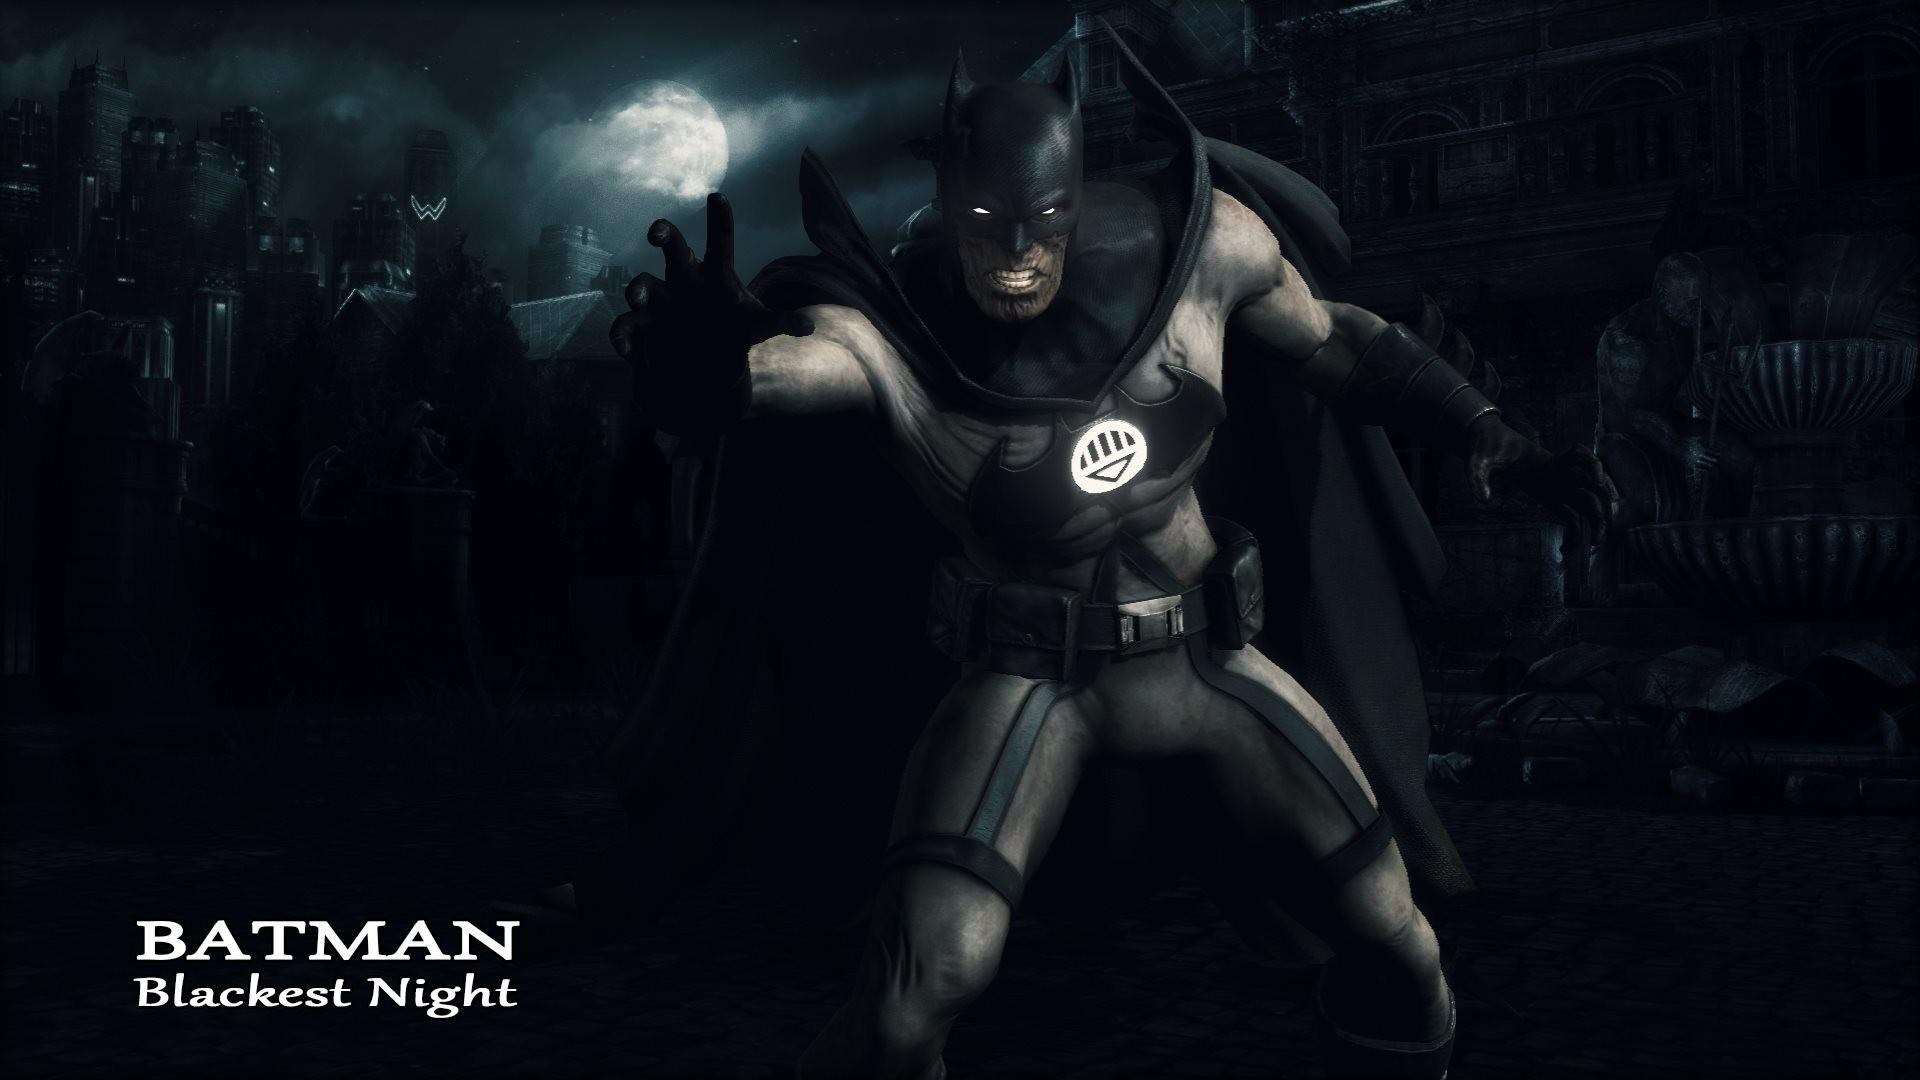 Filename: Batman superhero_HD.jpg